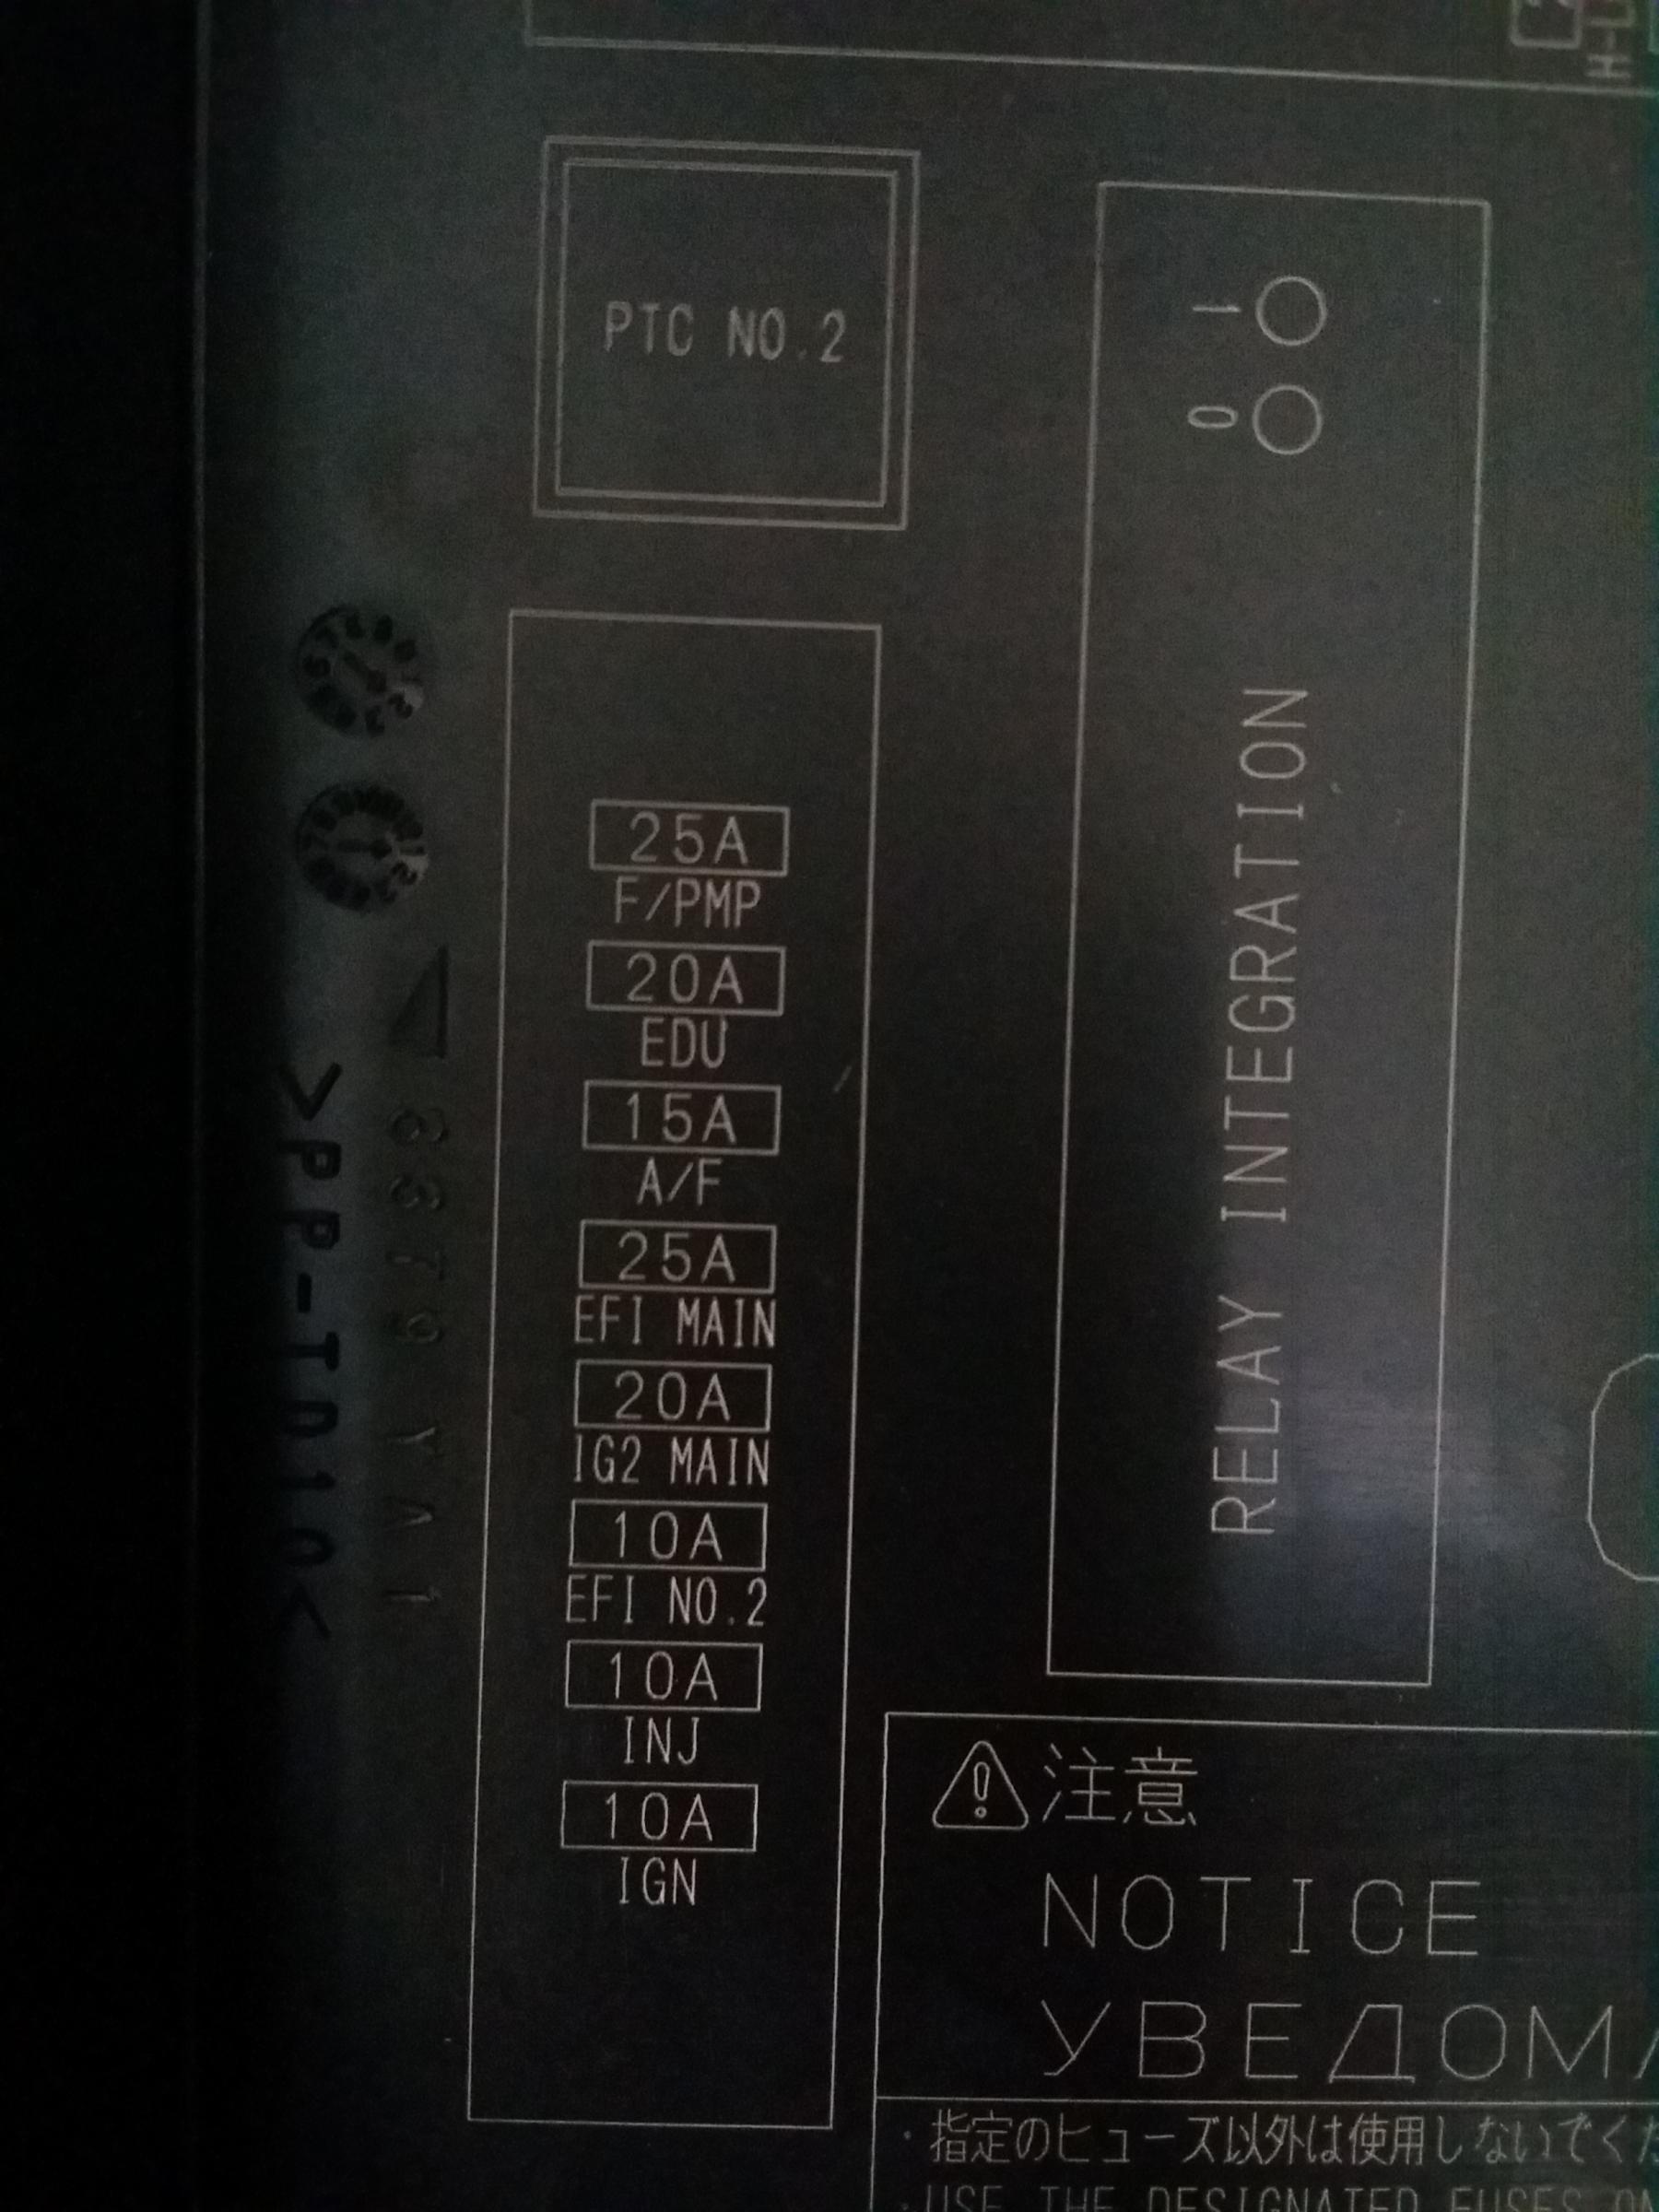 hight resolution of headlight wiring diagram 20131025 134510 jpg headlight wiring diagram 20131025 134633 jpg